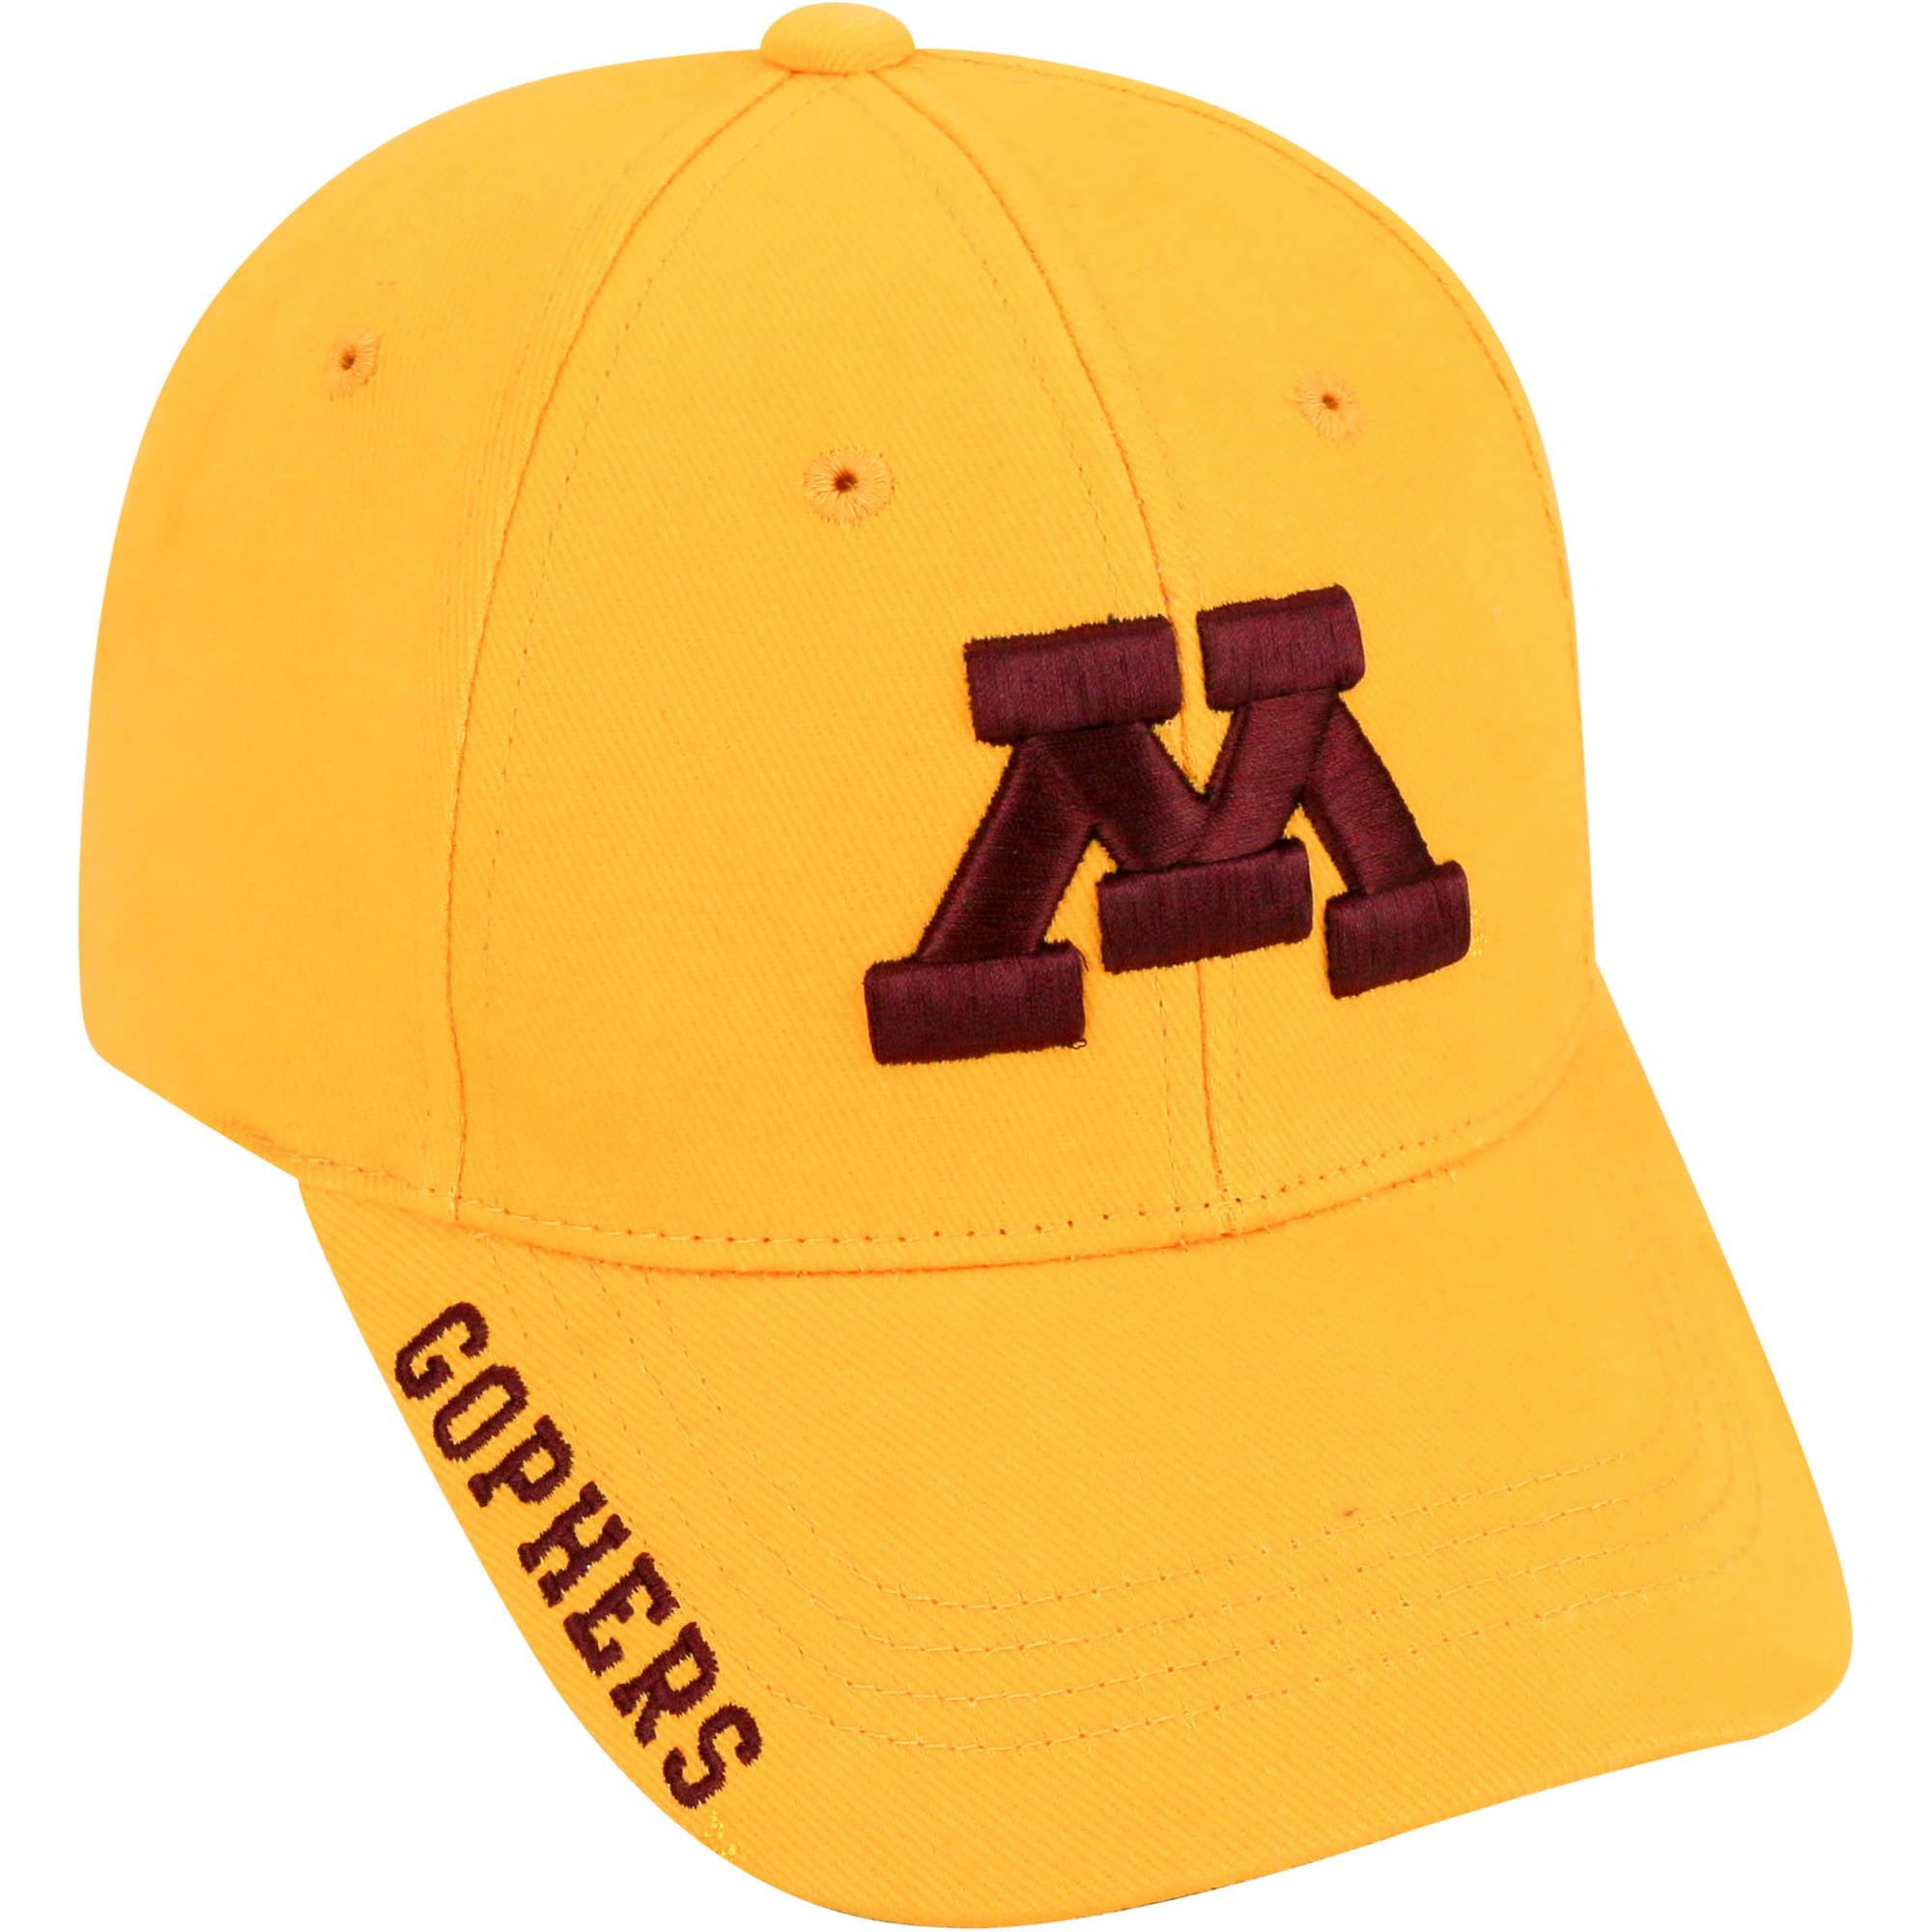 University Of Minnesota Golden Gophers Away Baseball Cap